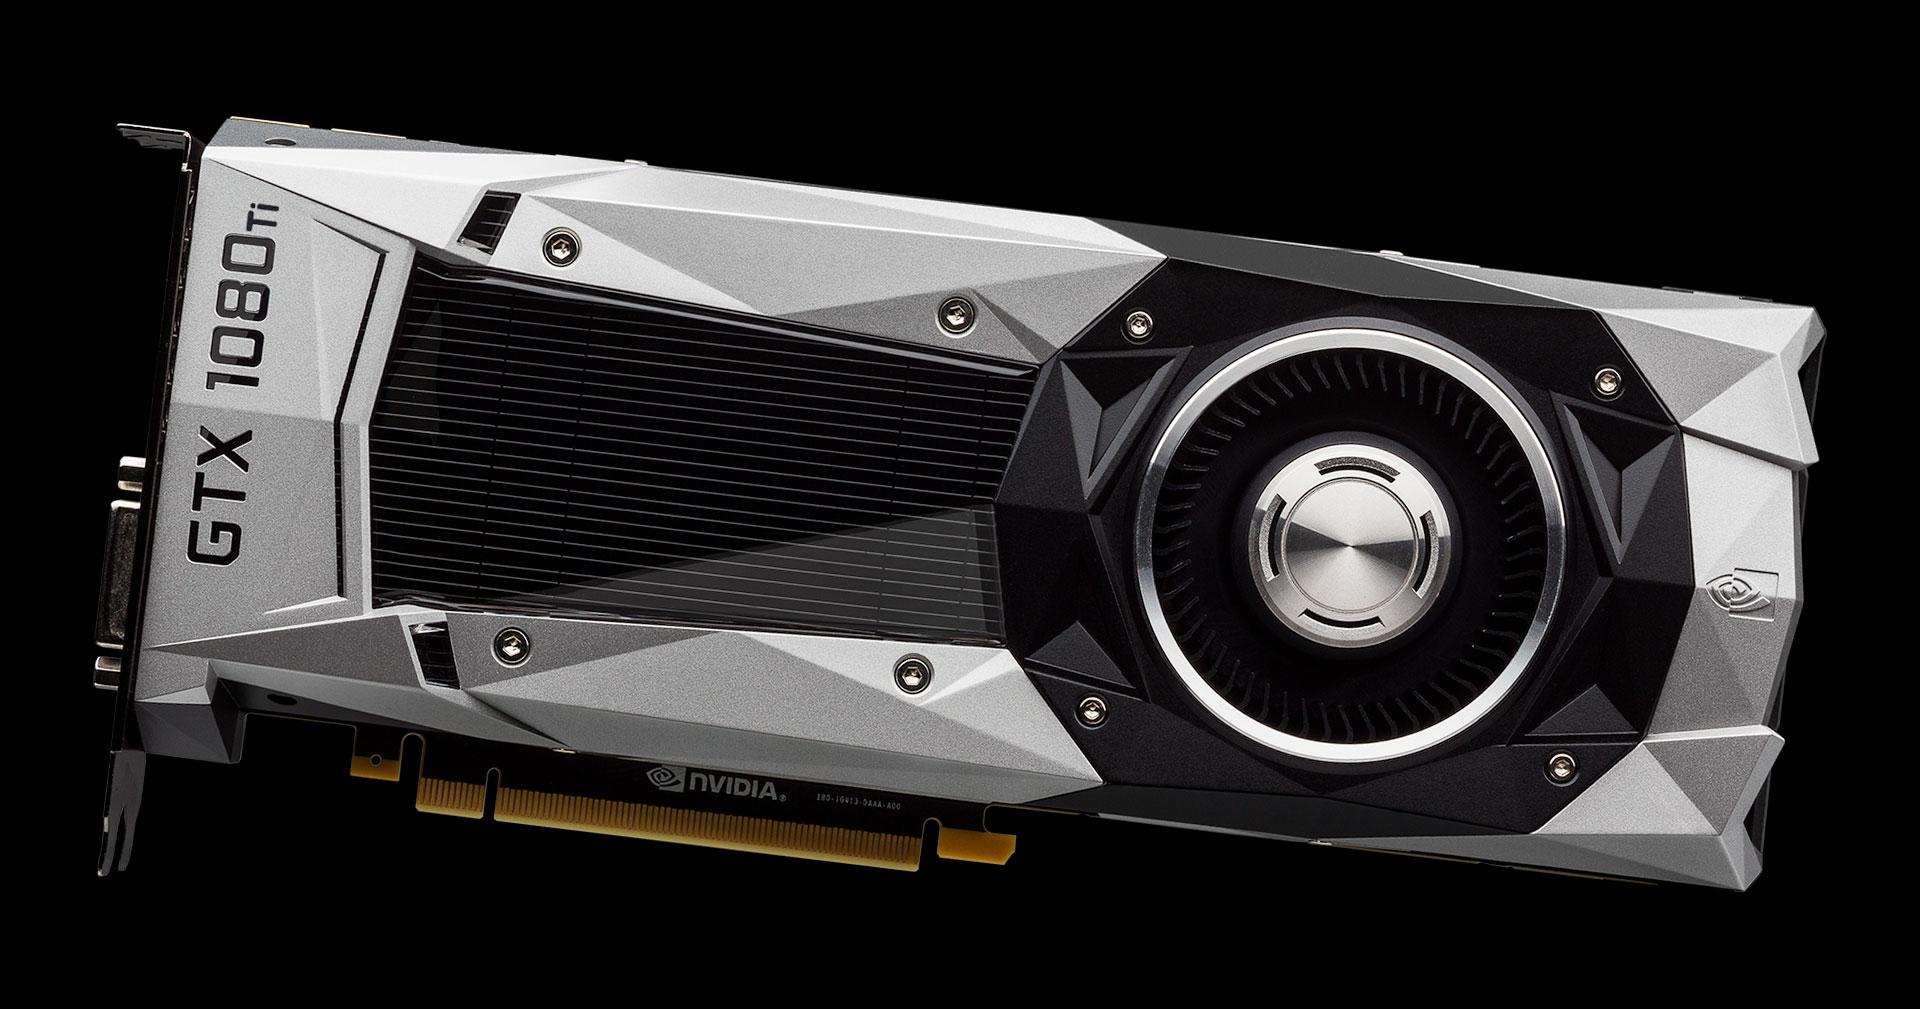 The best Nvidia GeForce GTX 1080 Ti deals | PC Gamer